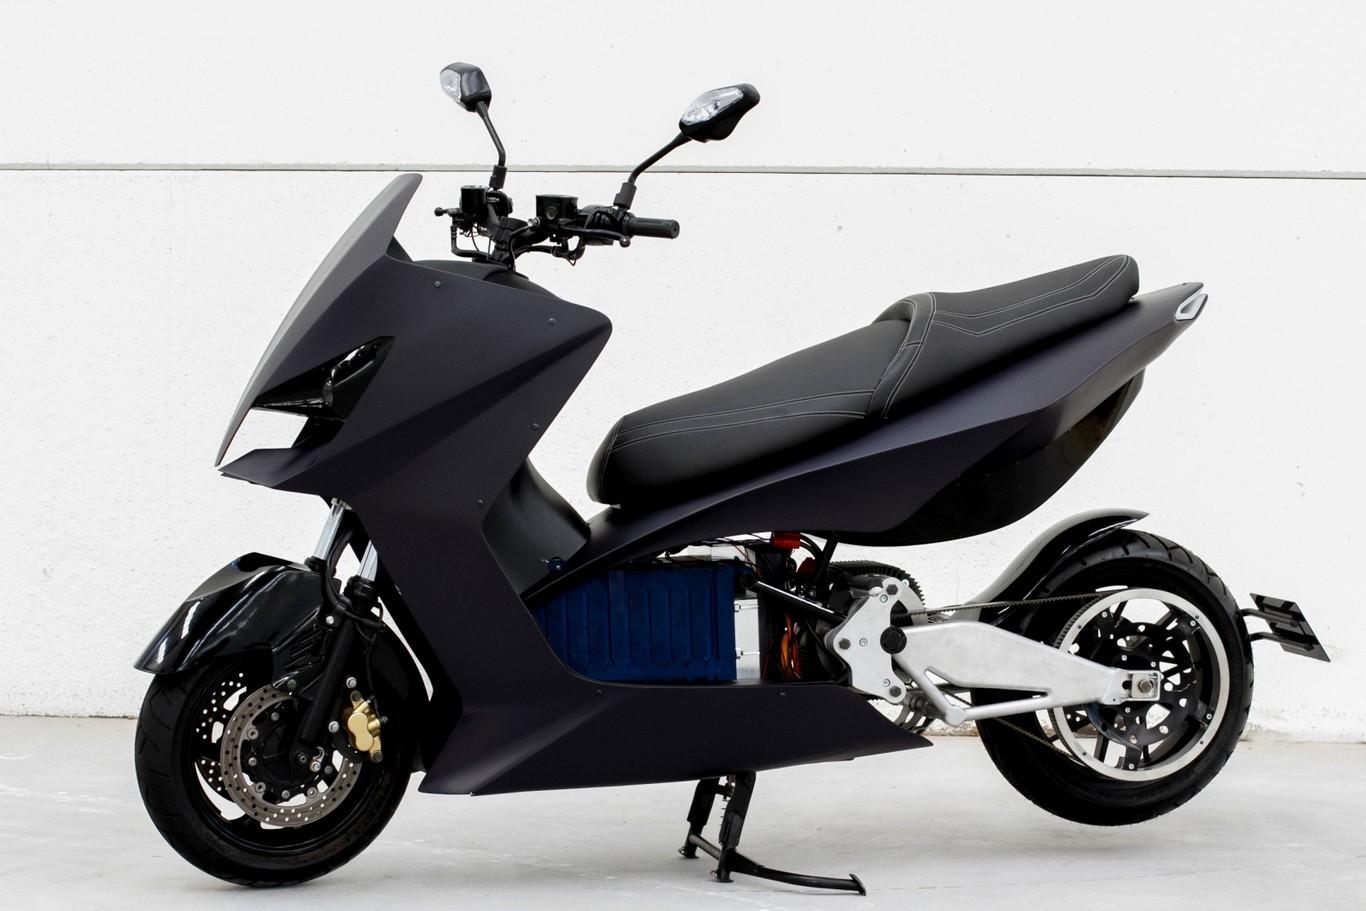 ¿Sabía que estas motos eléctricas son españolas?